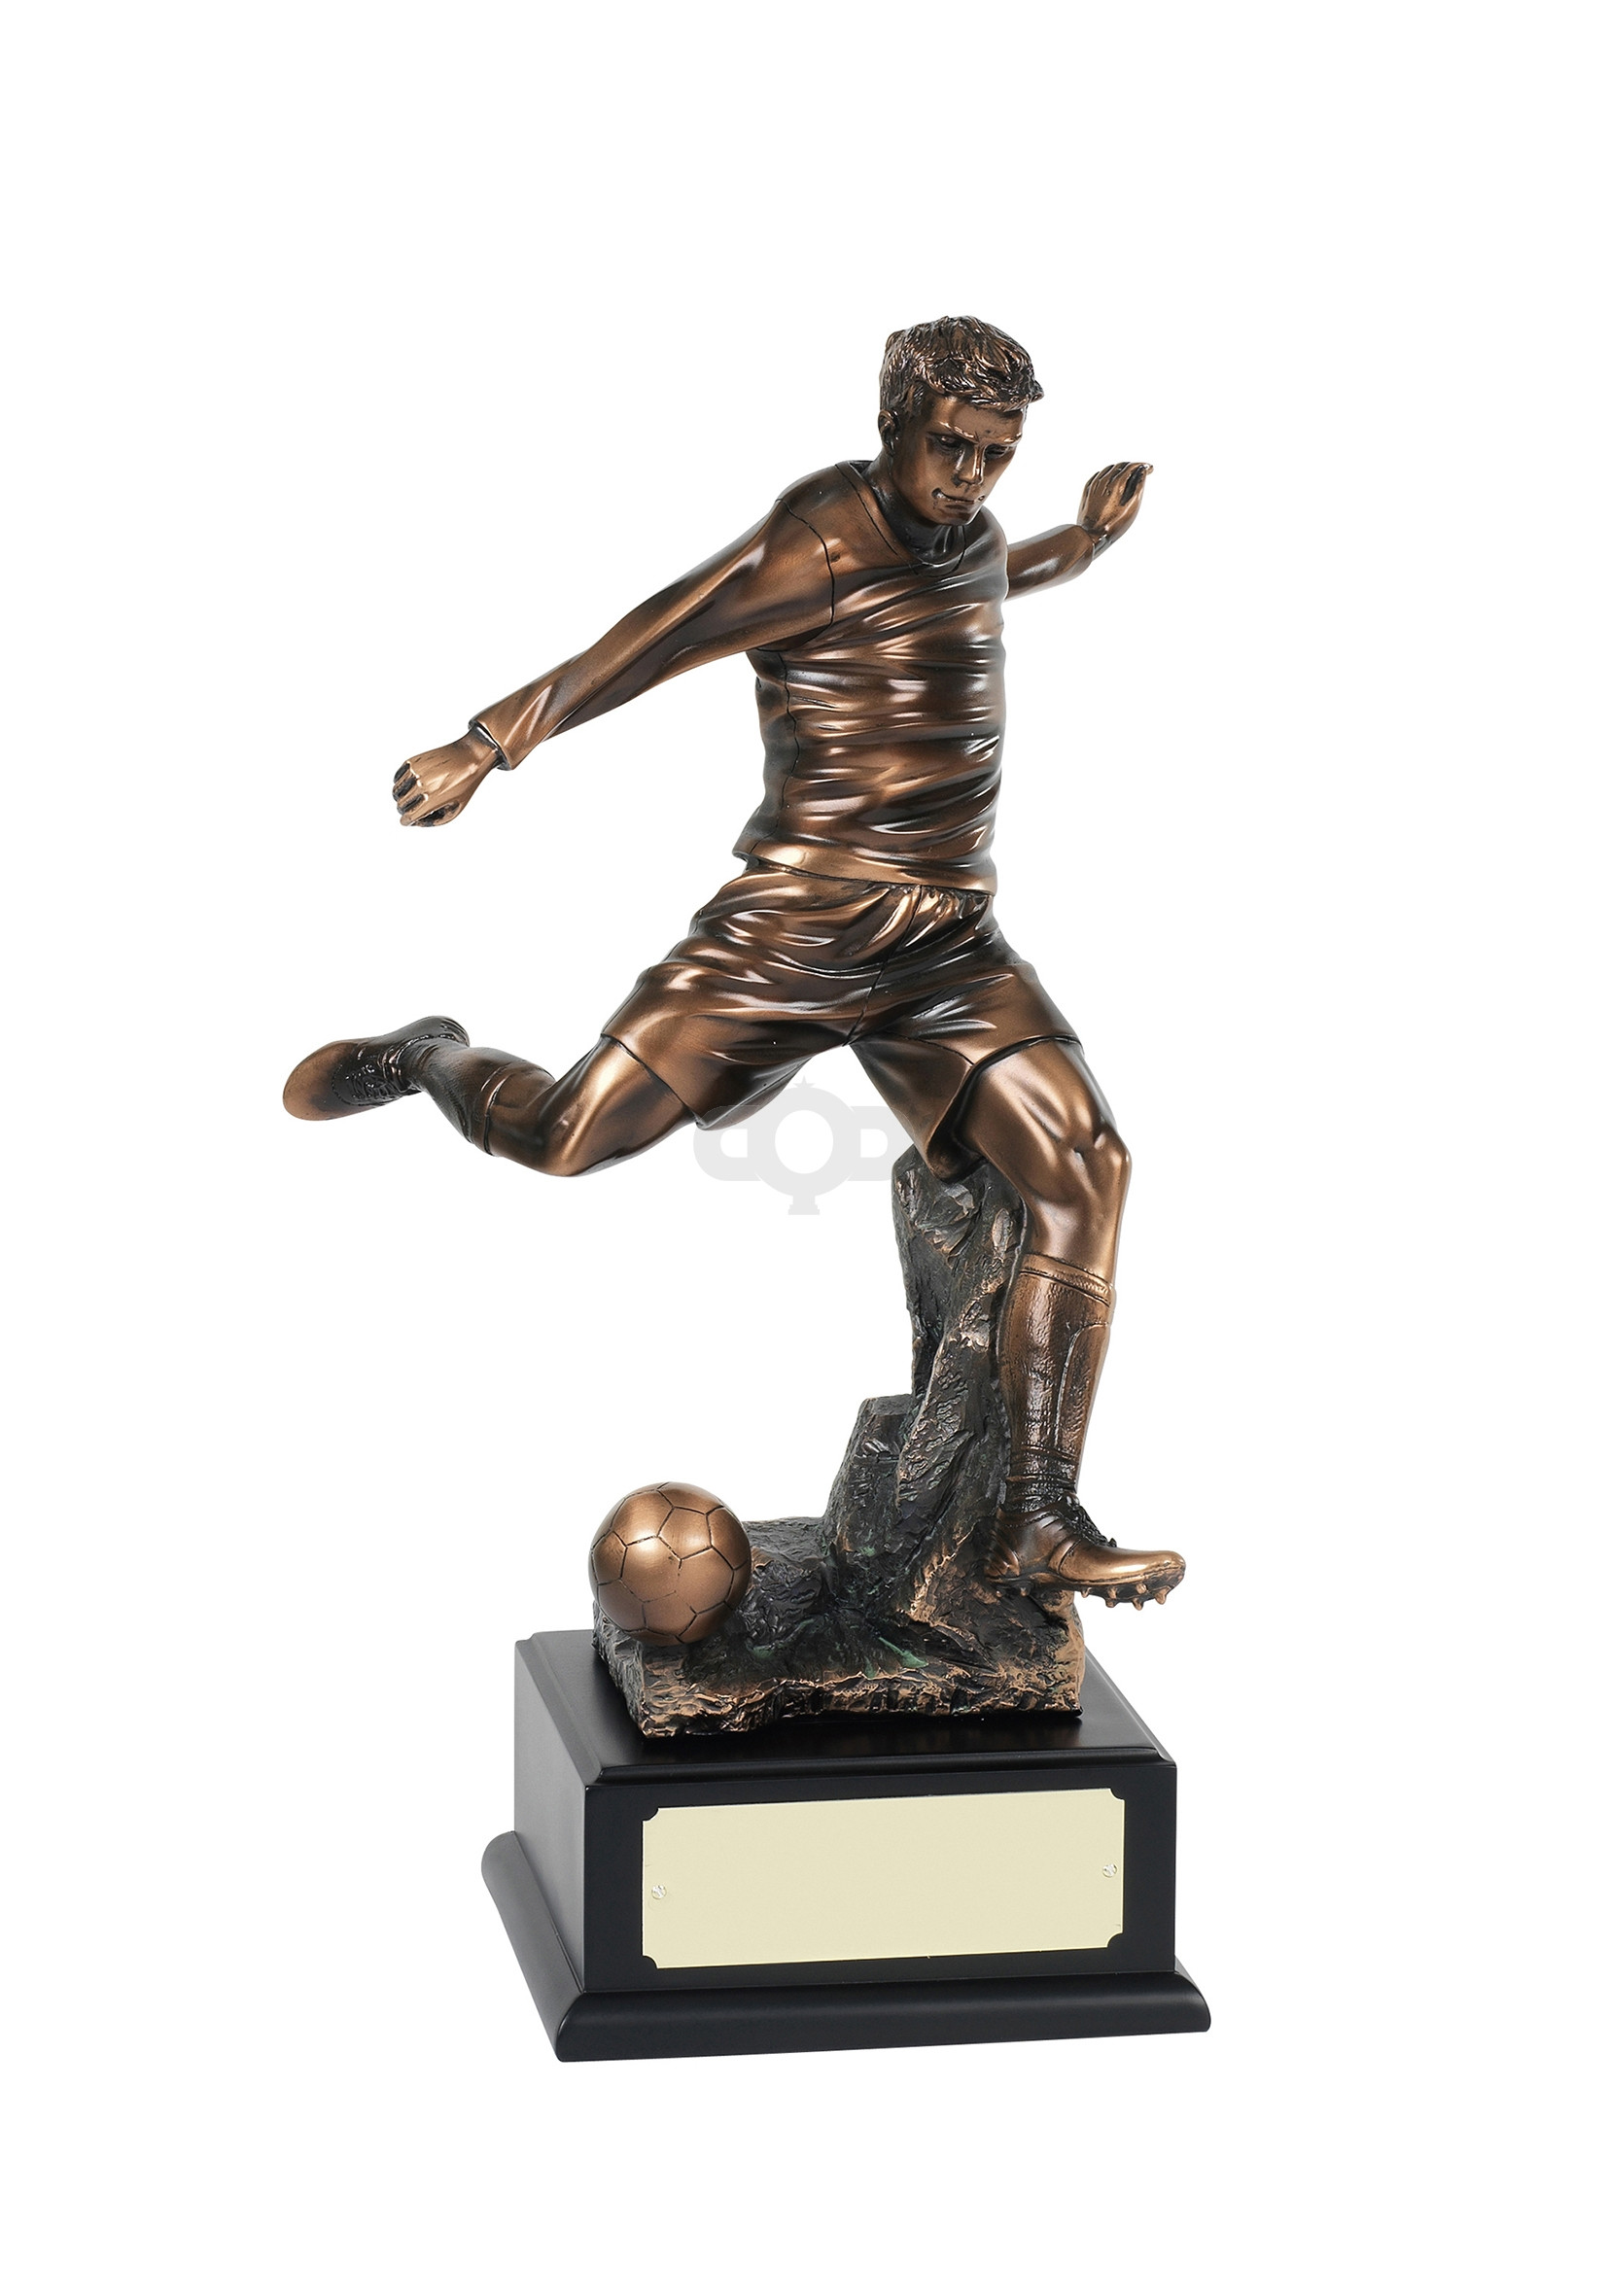 Highly Detailed Bronze Football Striker Trophy